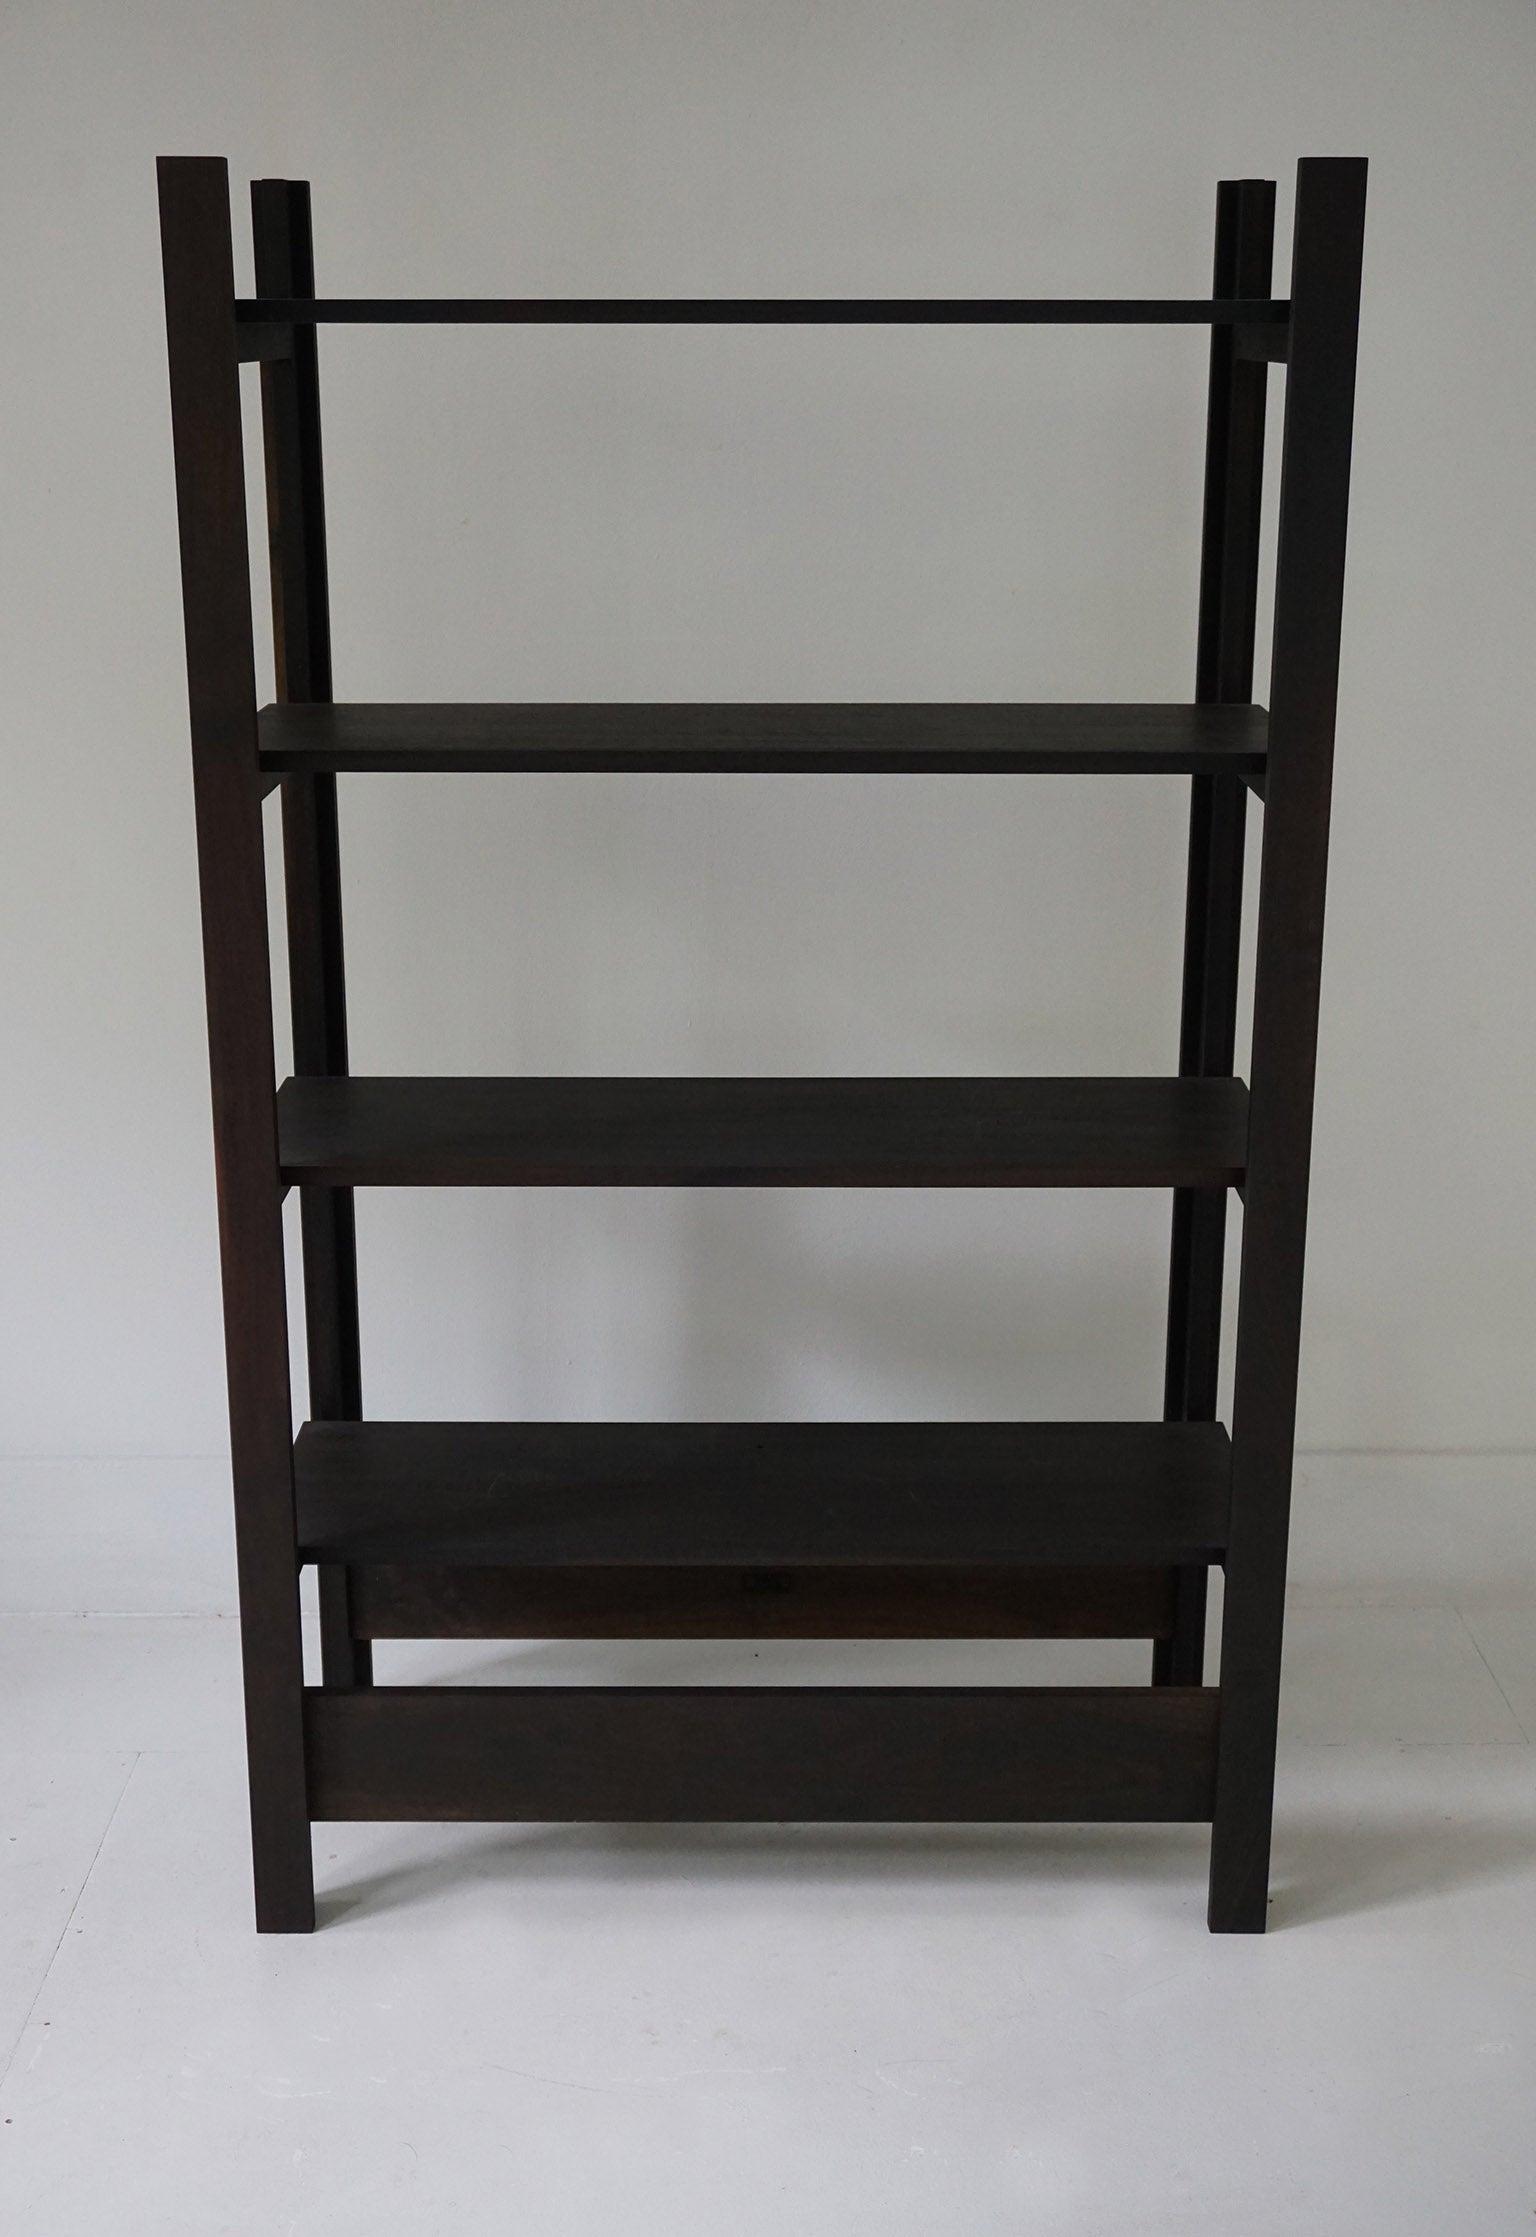 Upland Shelving Unit, Walnut Modern Minimal Bookshelf Or Display Shelves